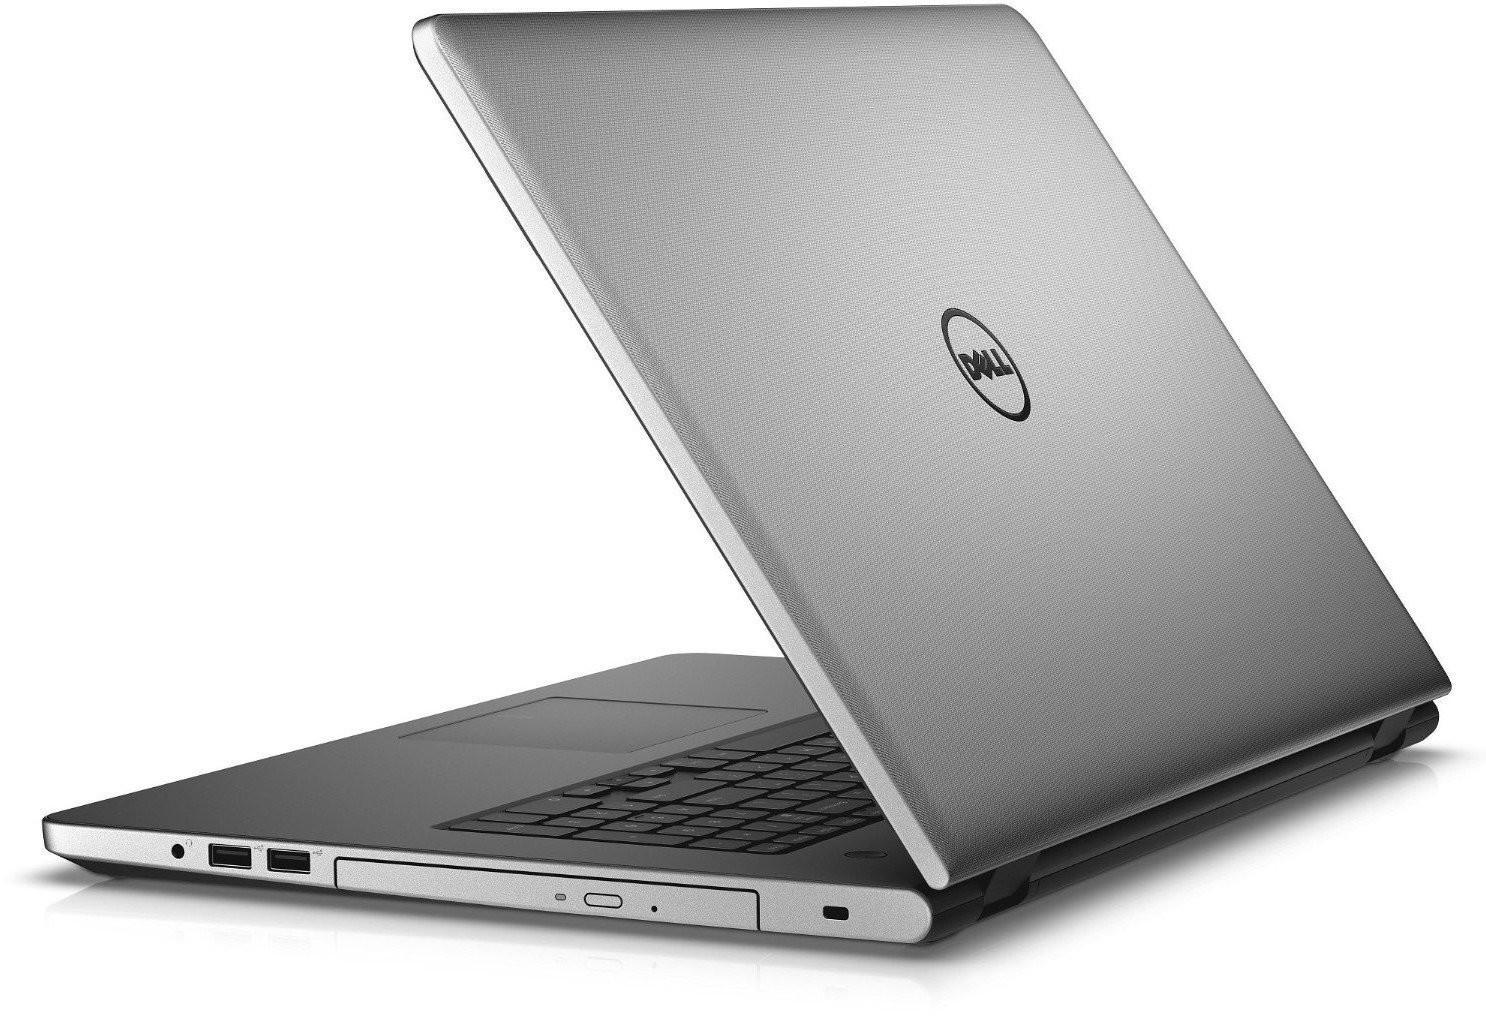 "Dell Inspiron 17 ( 5758 ) 17,3"", Core i3 2,0GHz, 8GB RAM, 1000GB HDD"